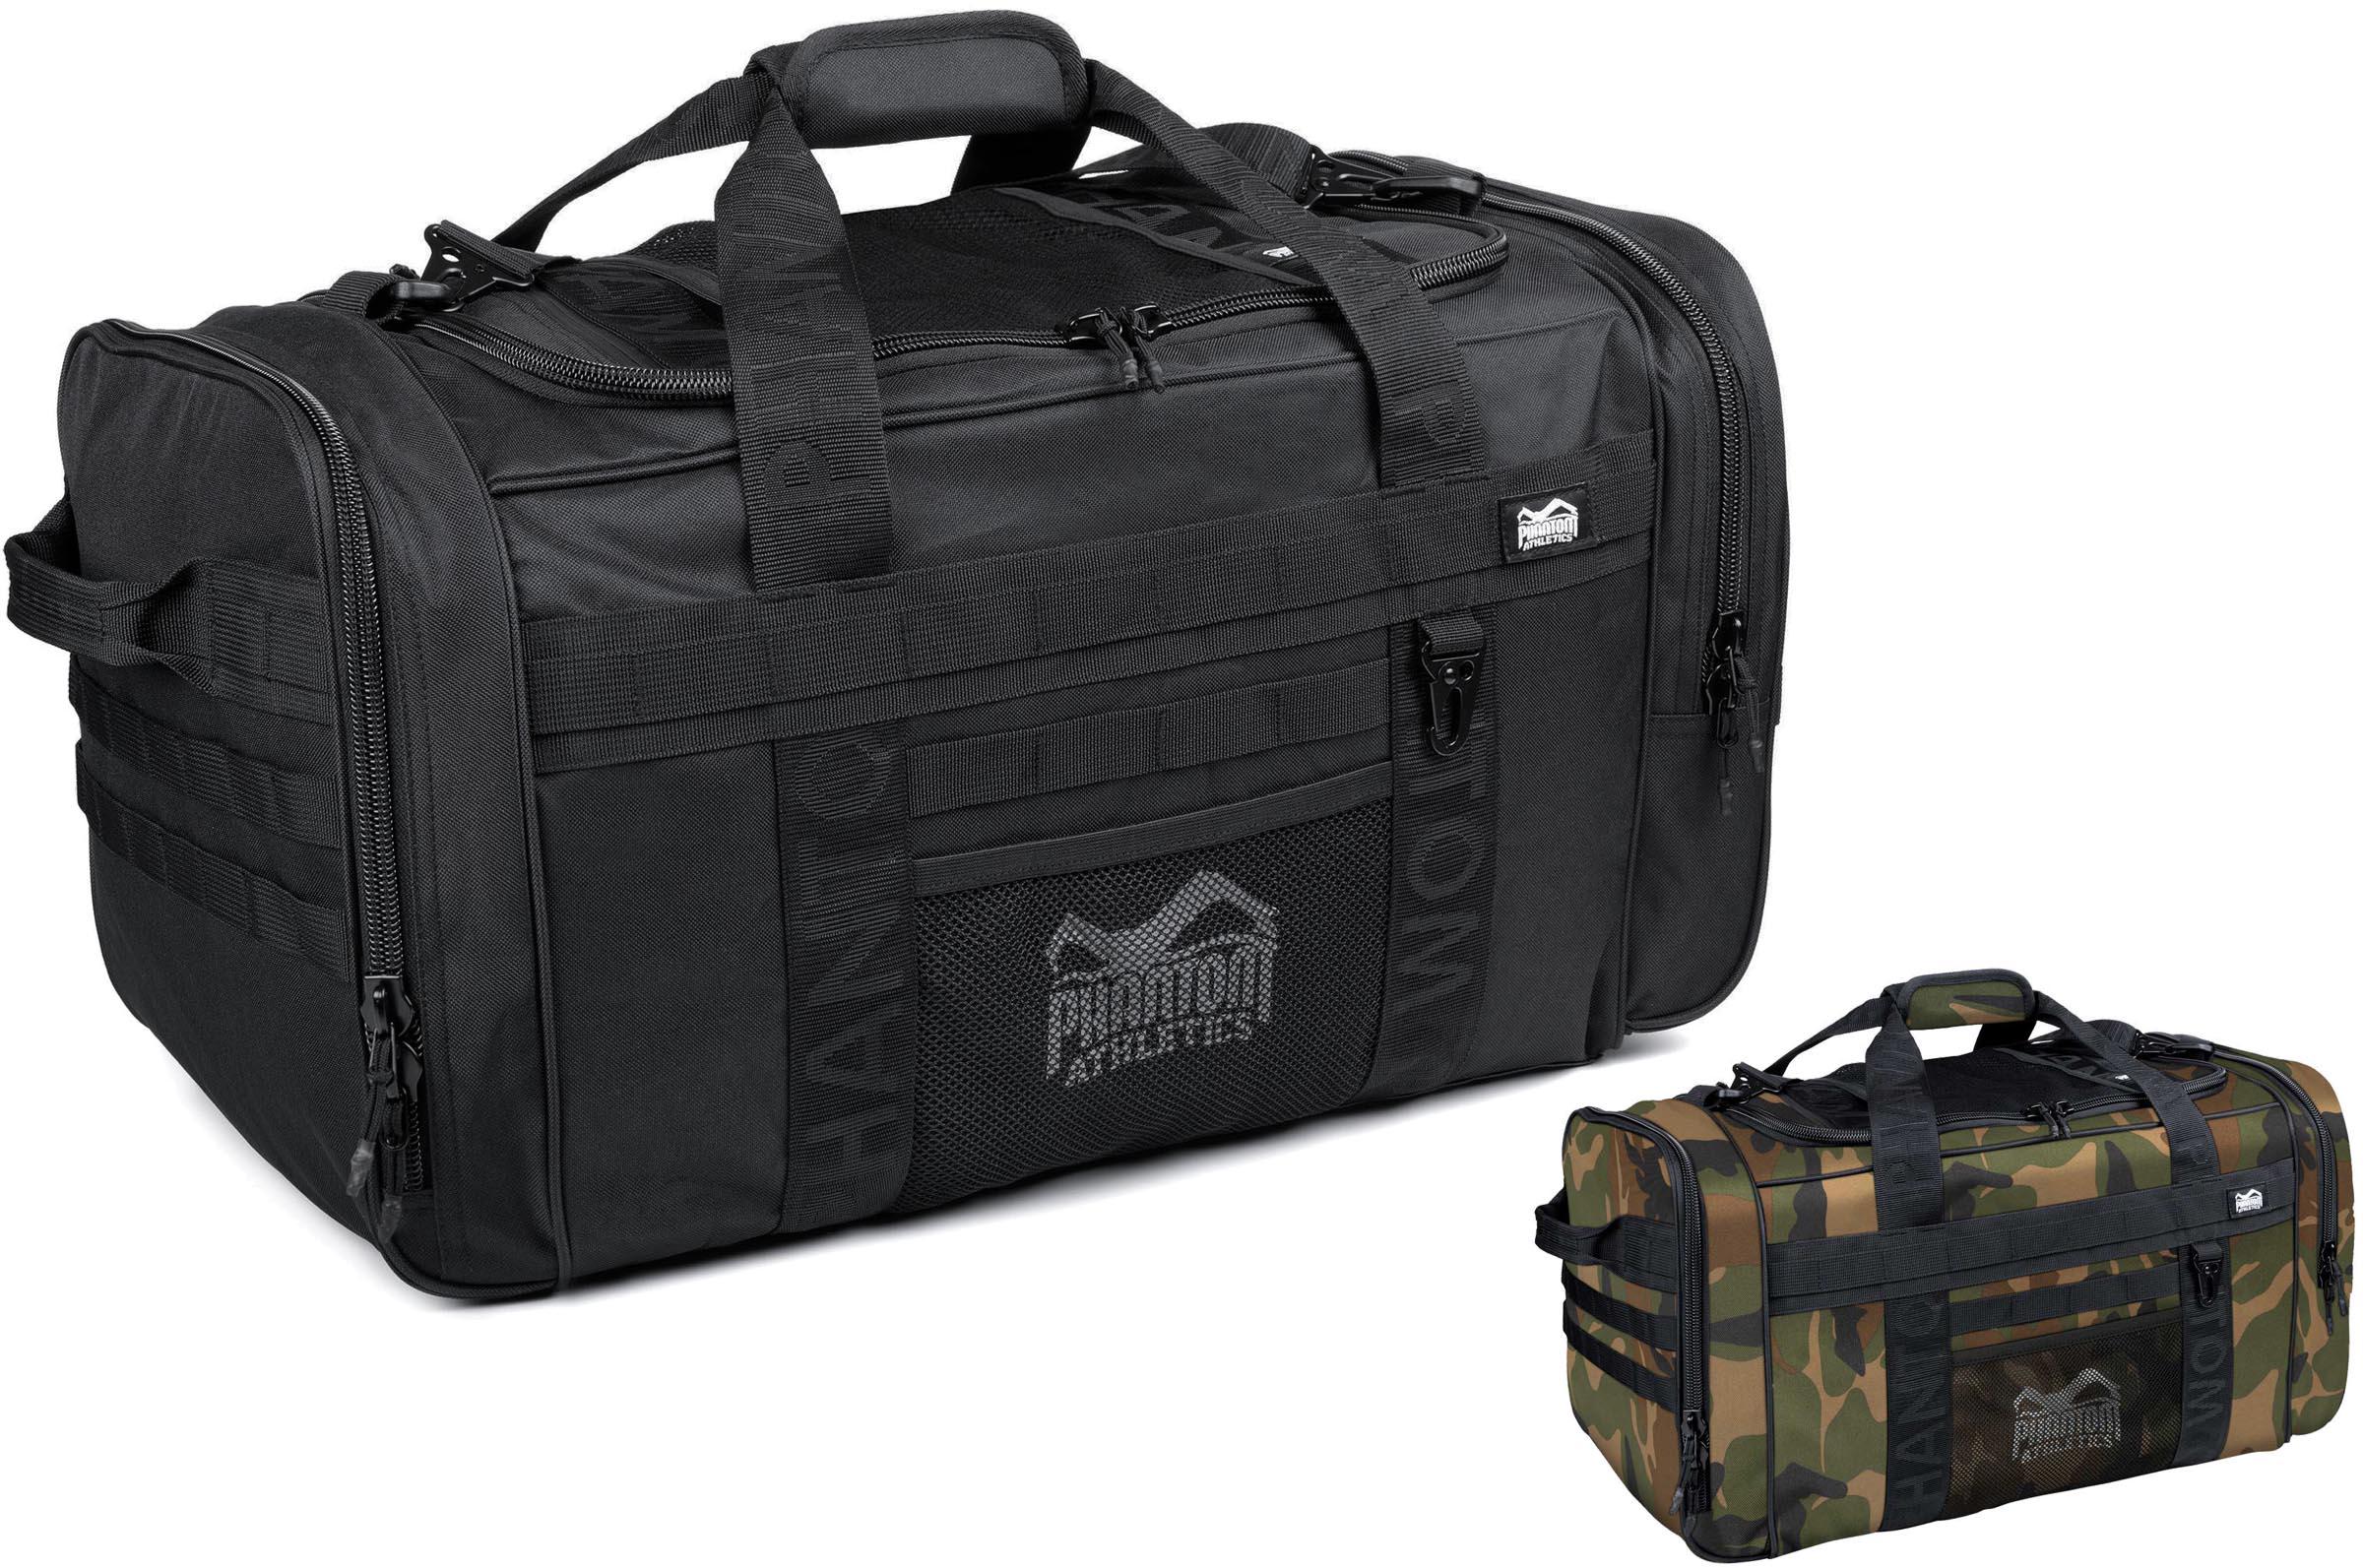 Gym duffle Bag - Tactic, Phantom Athletics